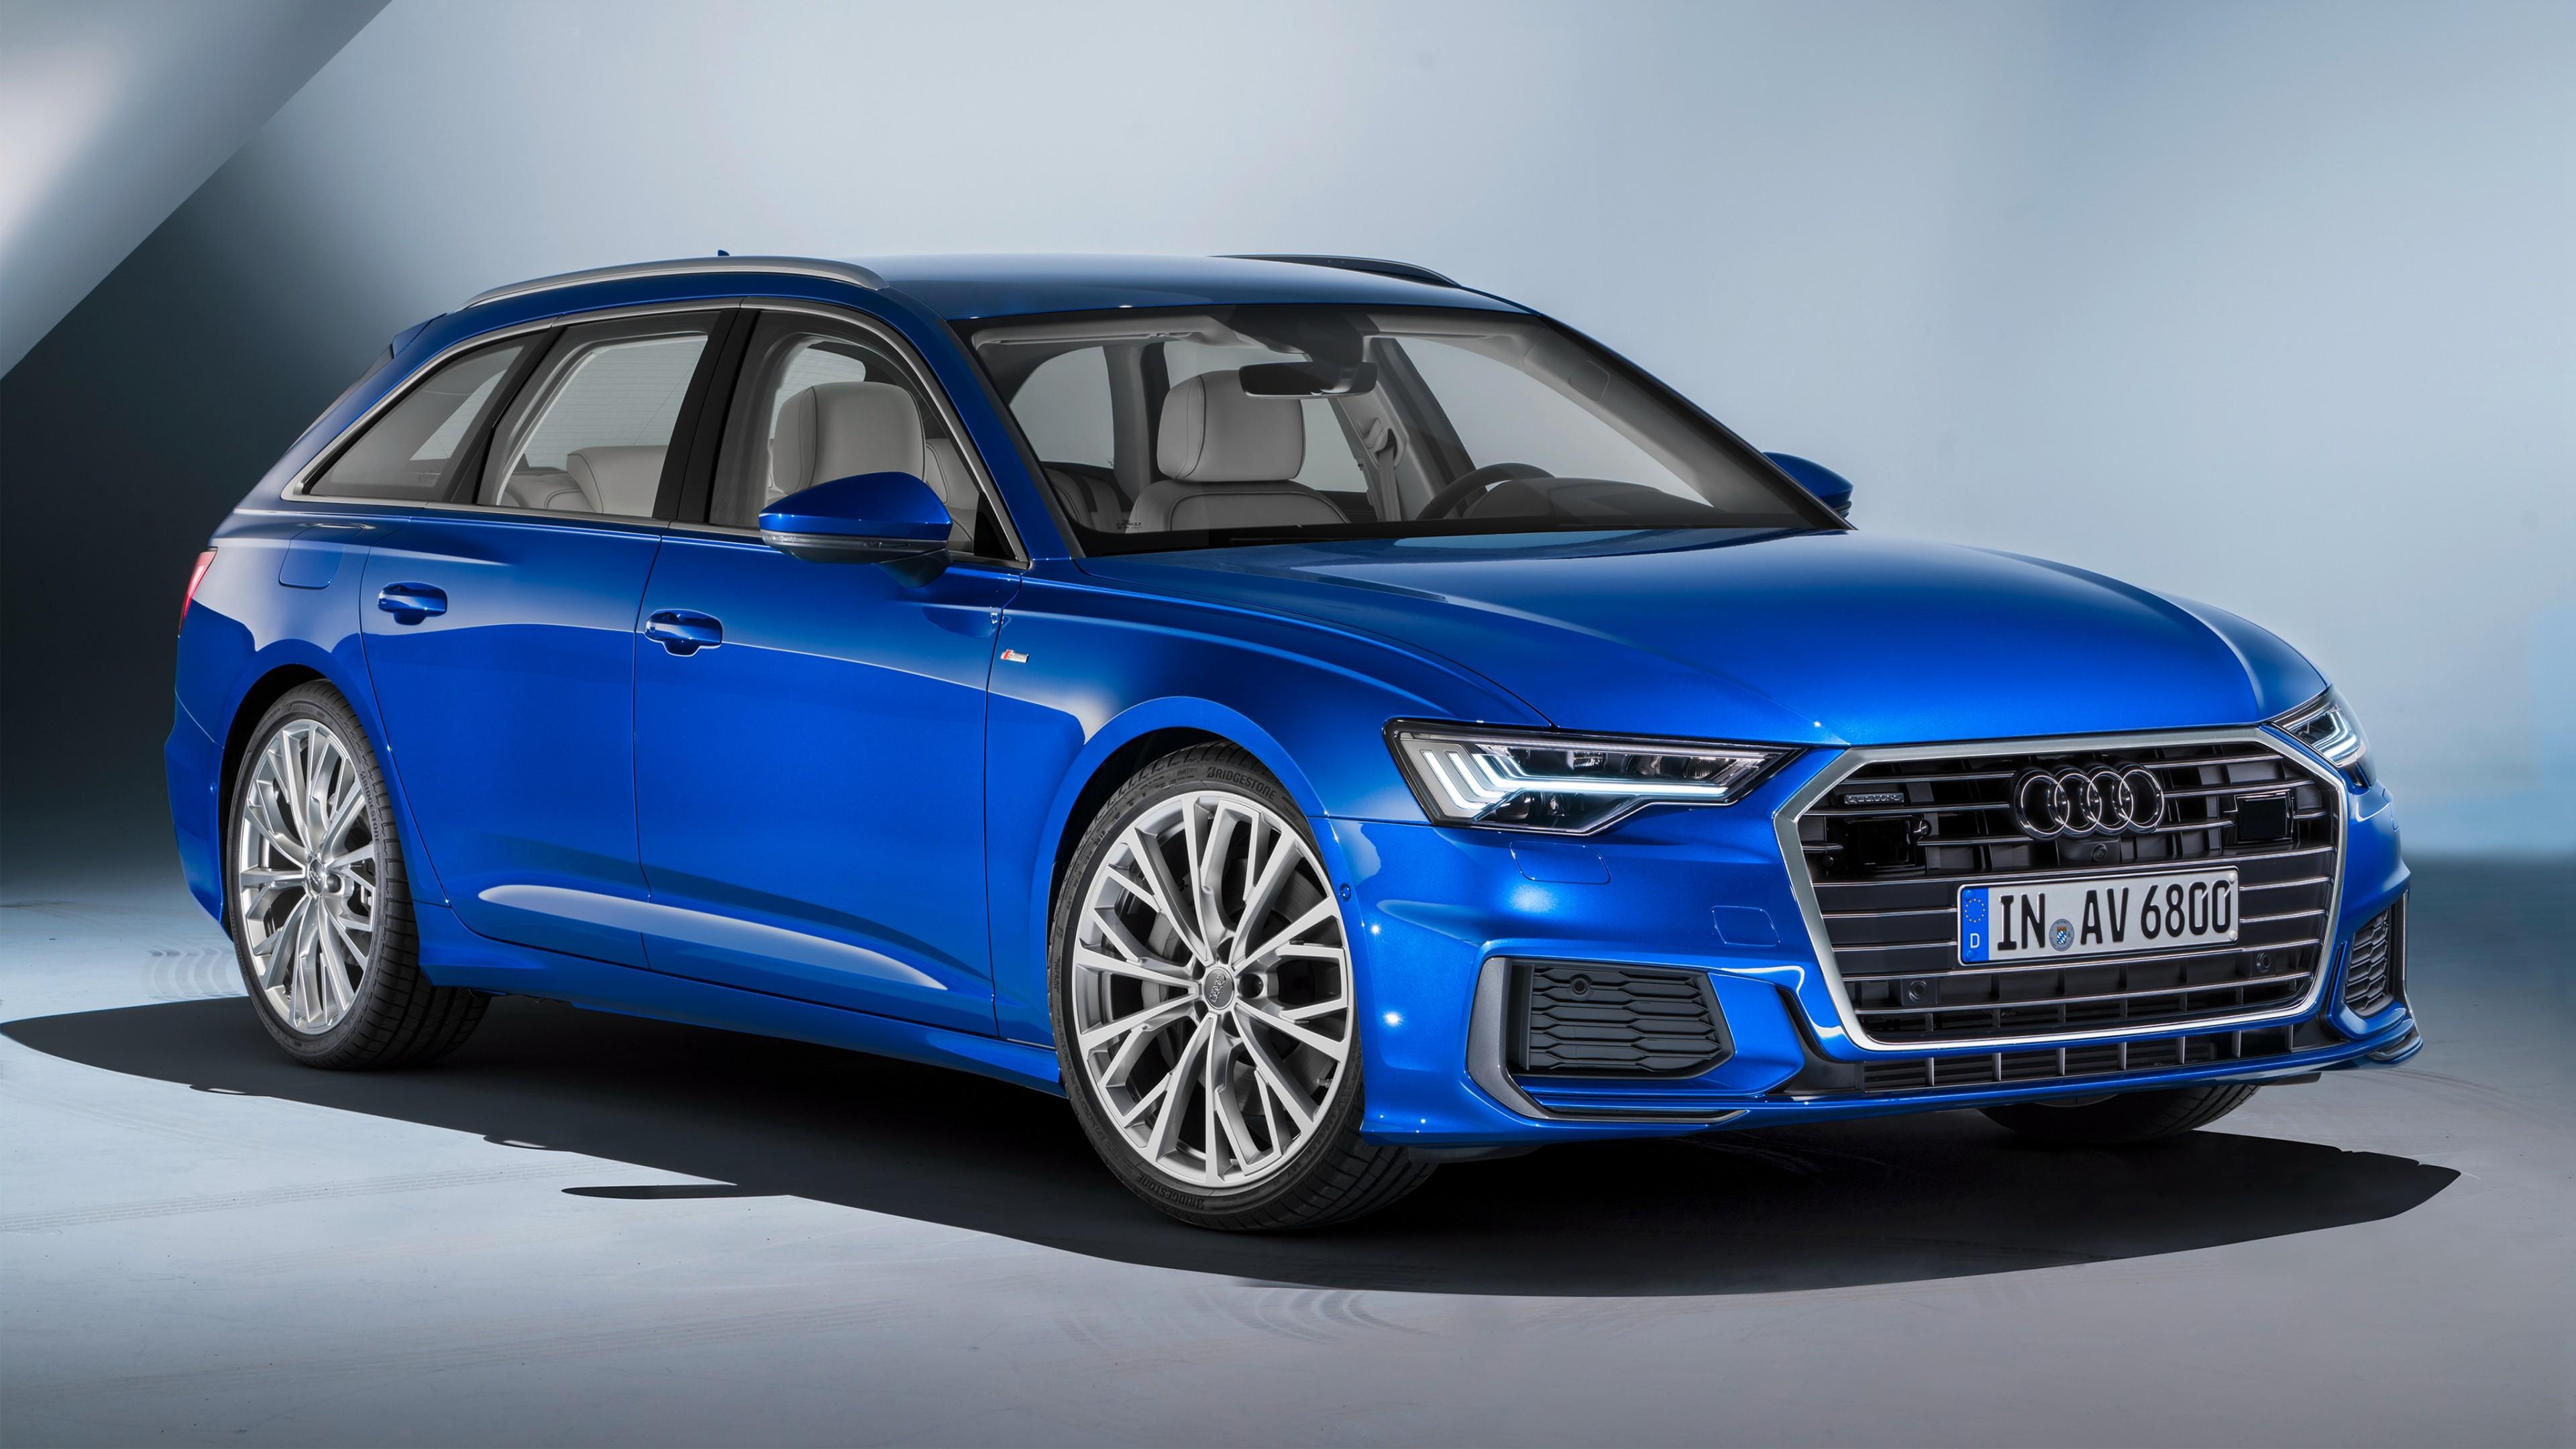 2018 Audi A6 55 Tfsi Quattro S Line Avant 4k Wallpaper Hd Car Wallpapers Id 10171